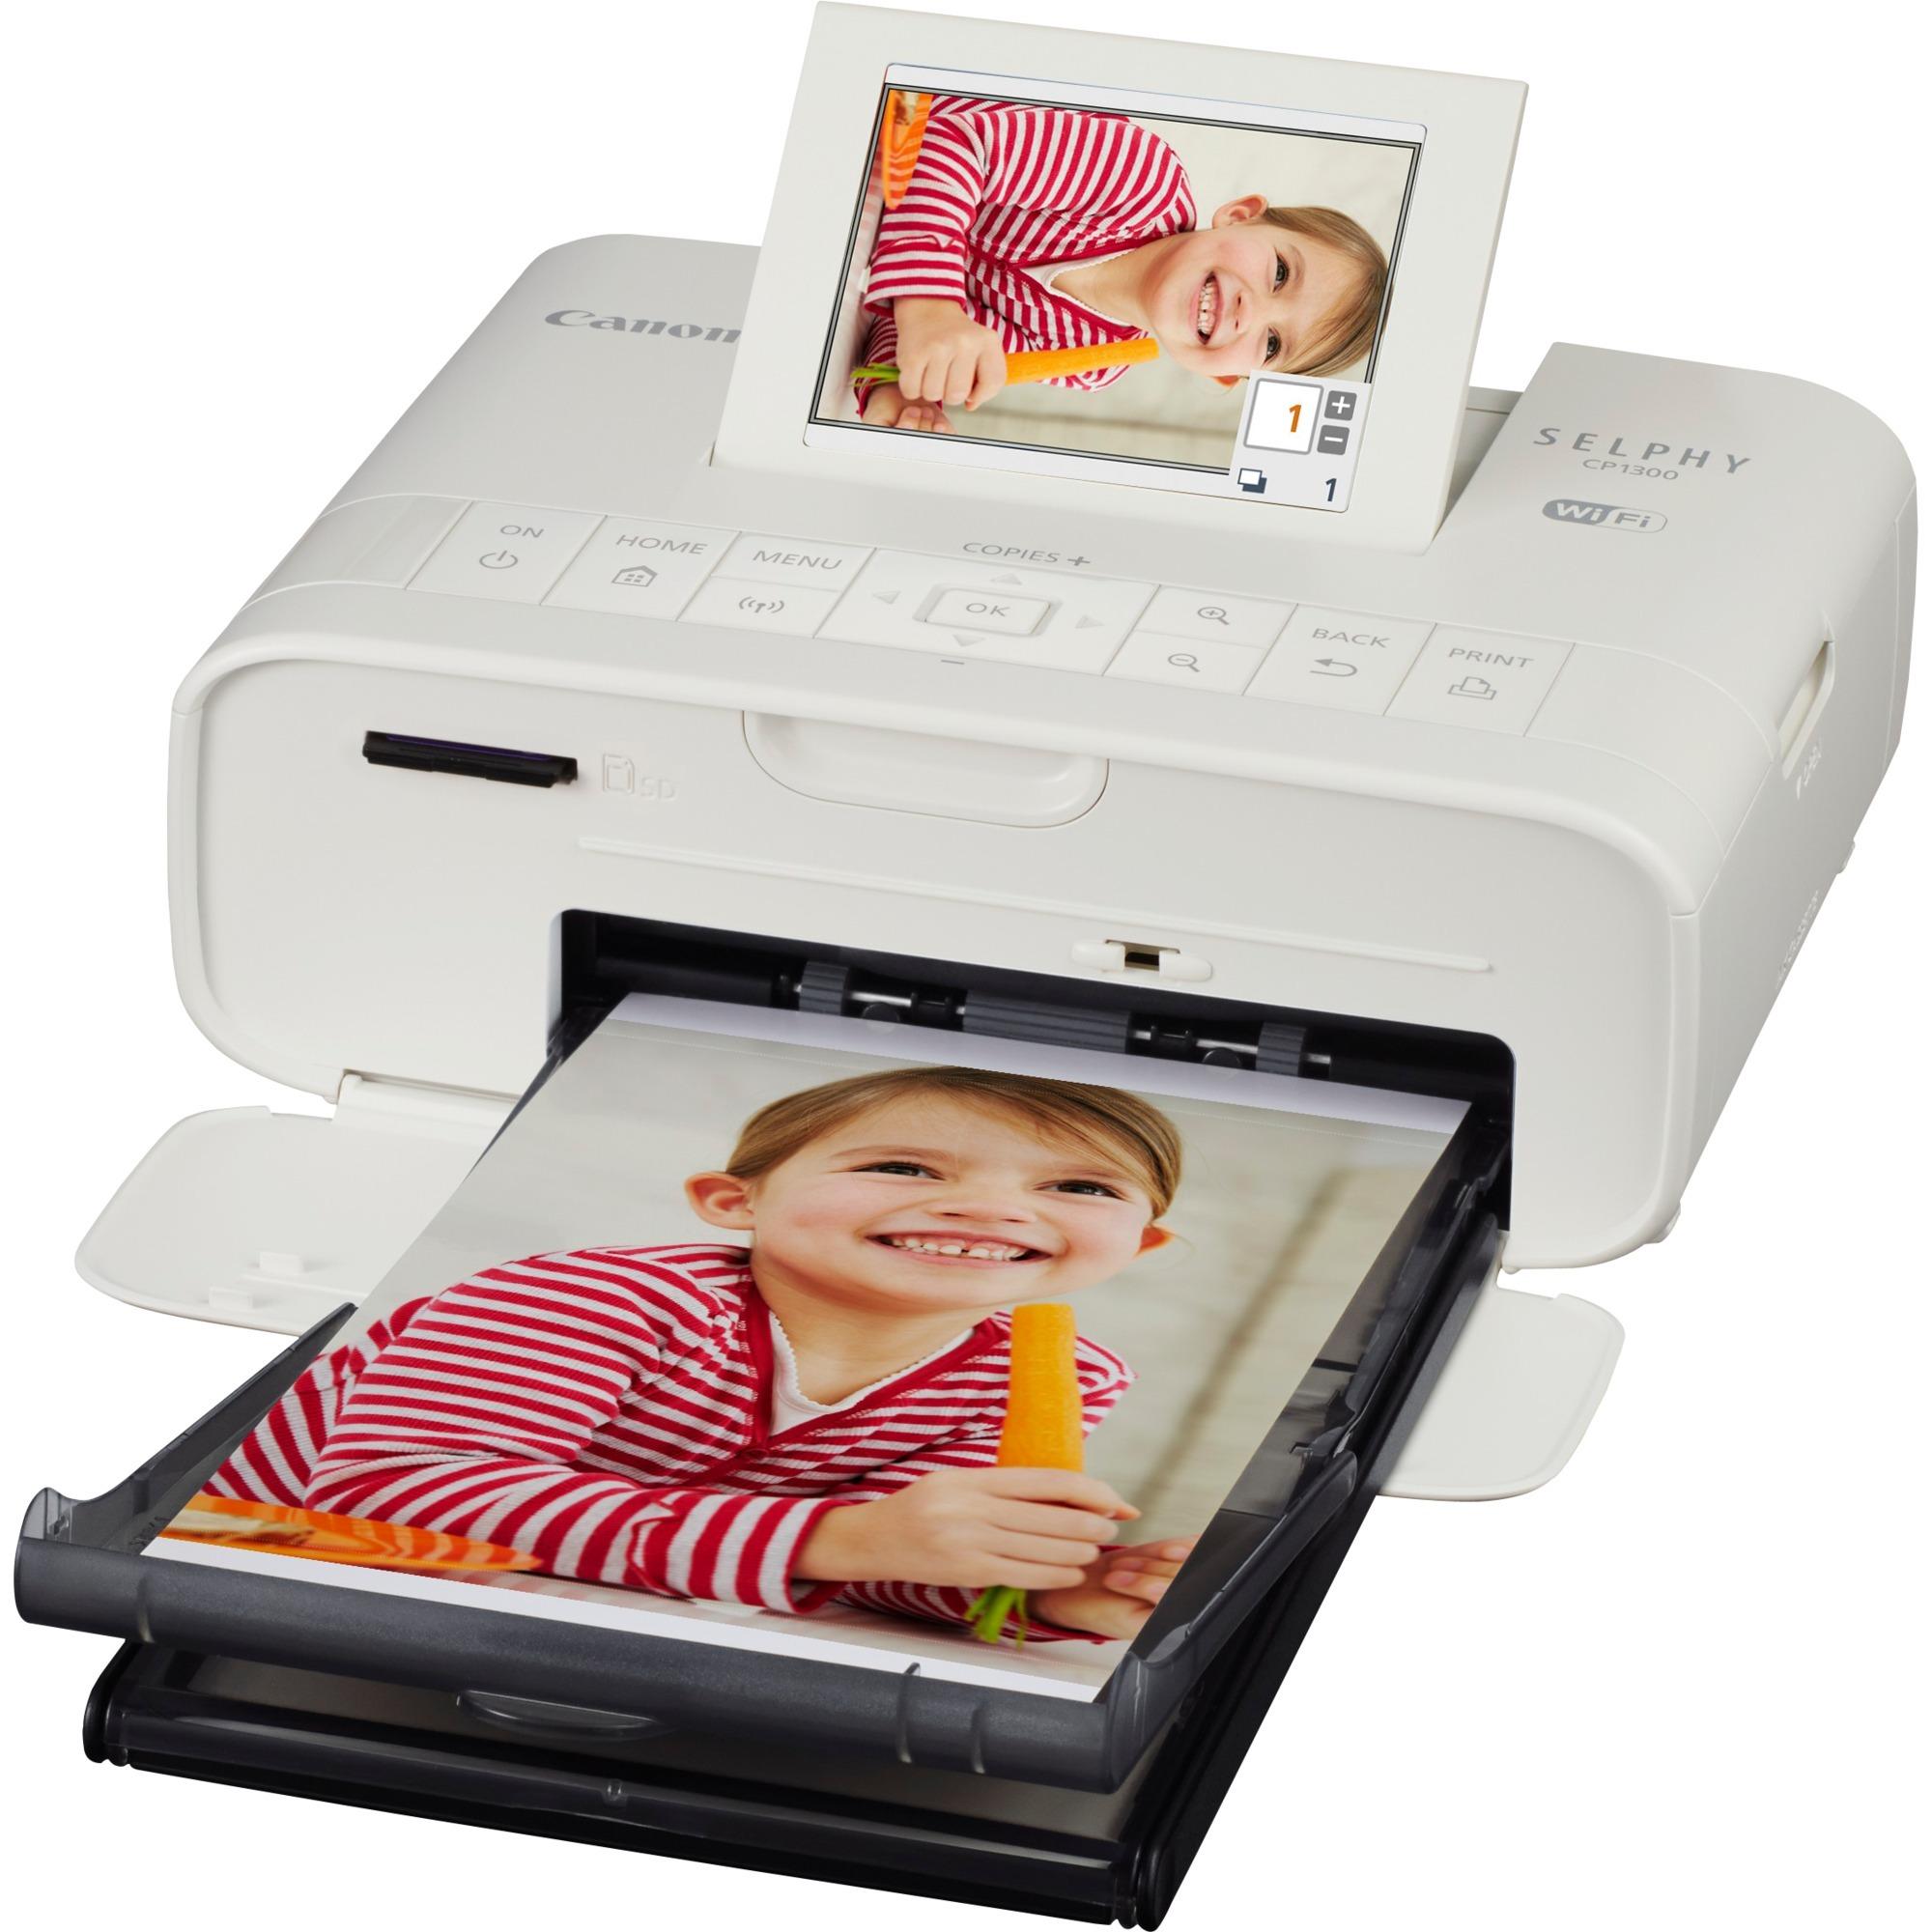 SELPHY CP1300 Sublimation de teinte 300 x 300DPI Wifi imprimante photo